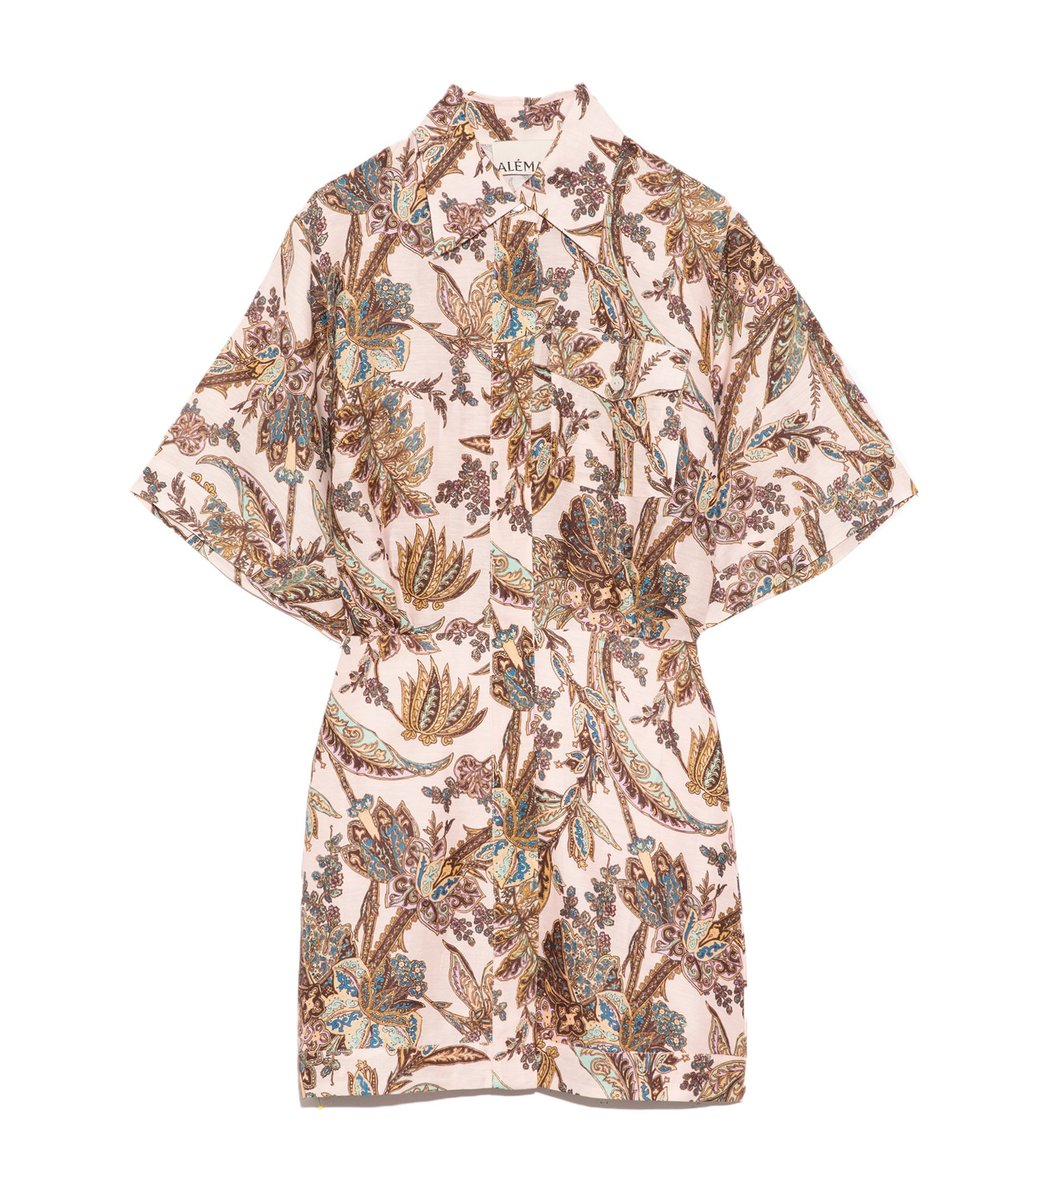 Alemais Estella Shirt Dress In Blush In Multi